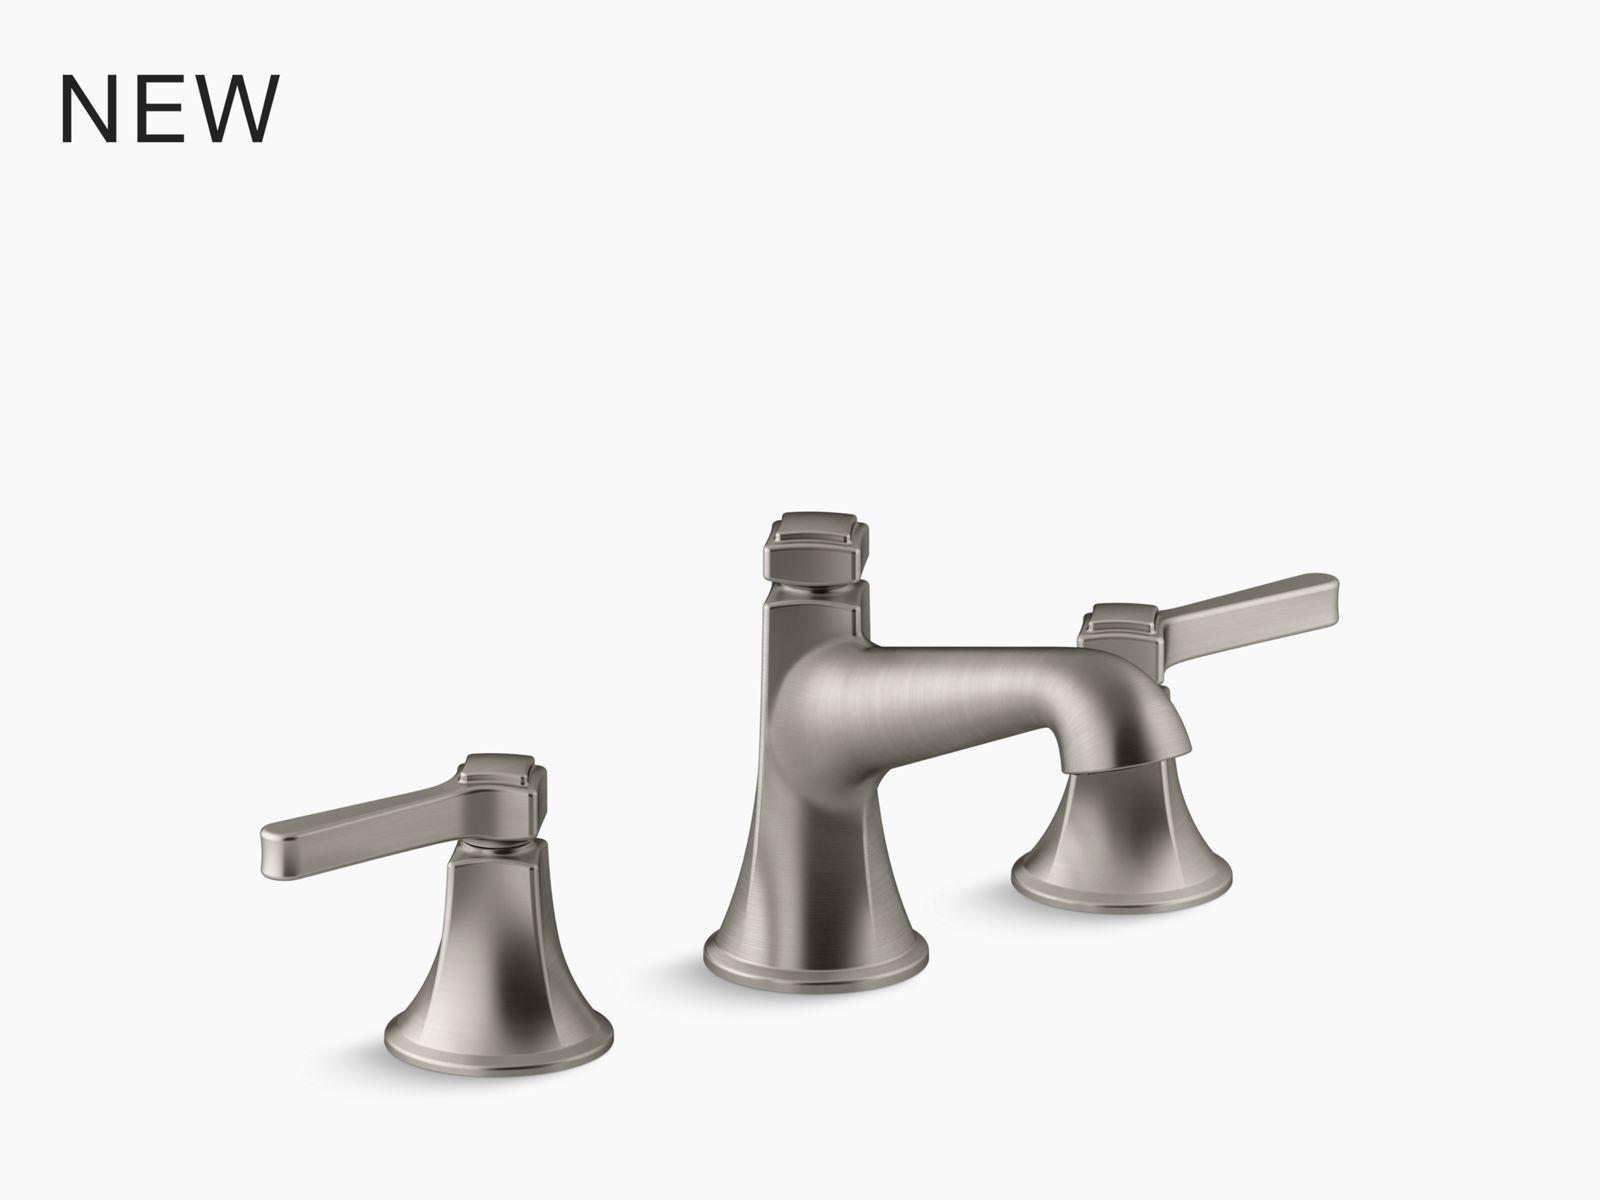 undertone 10 3 4 x 17 1 2 x 5 5 8 small square undermount single bowl kitchen sink